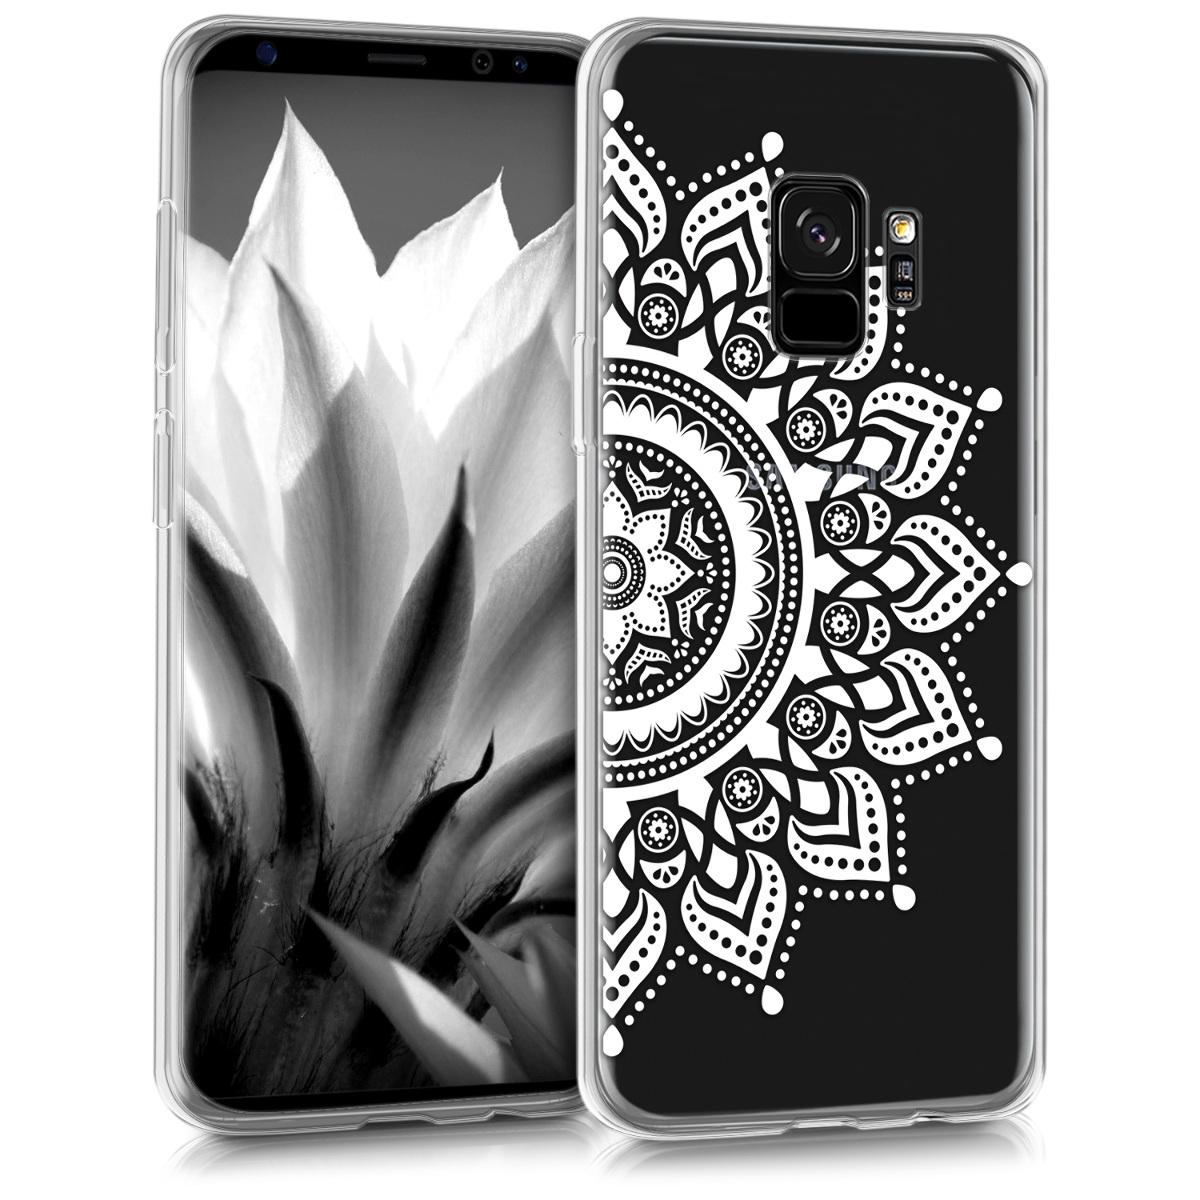 Transparentní pouzdro pro  Samsung Galaxy S9 - TPU Smartphone Backcover - Rising Sun White / Transparent